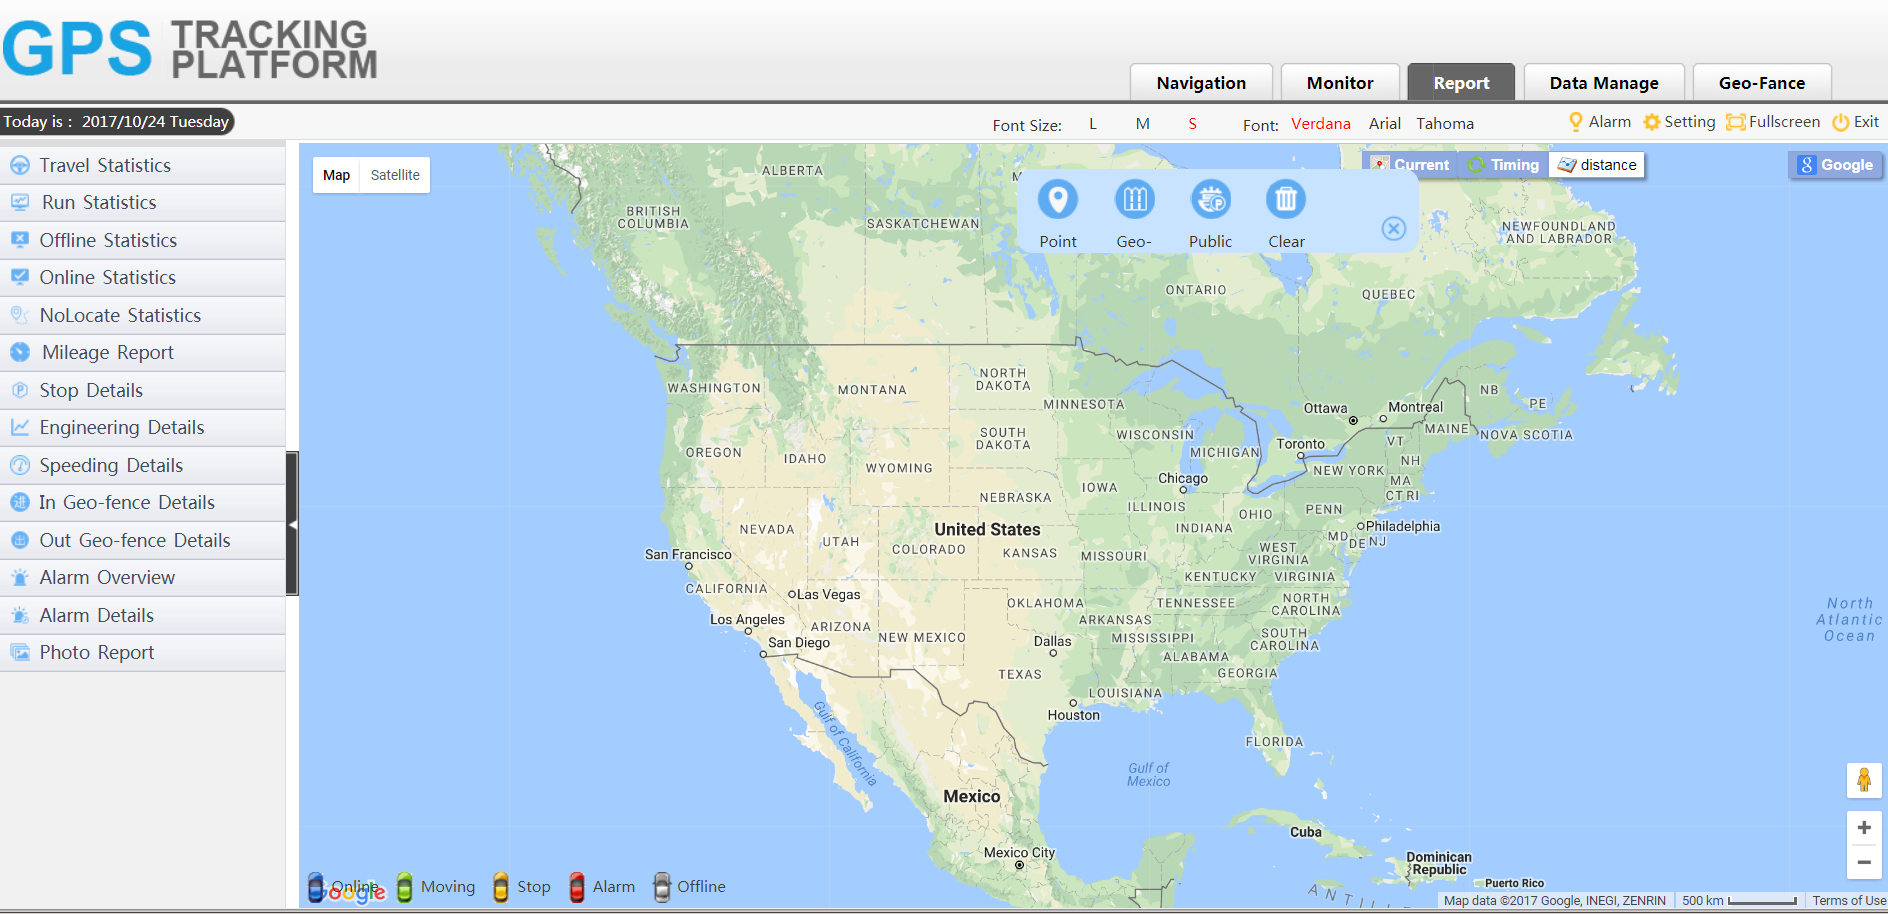 gps tracker platform reporting